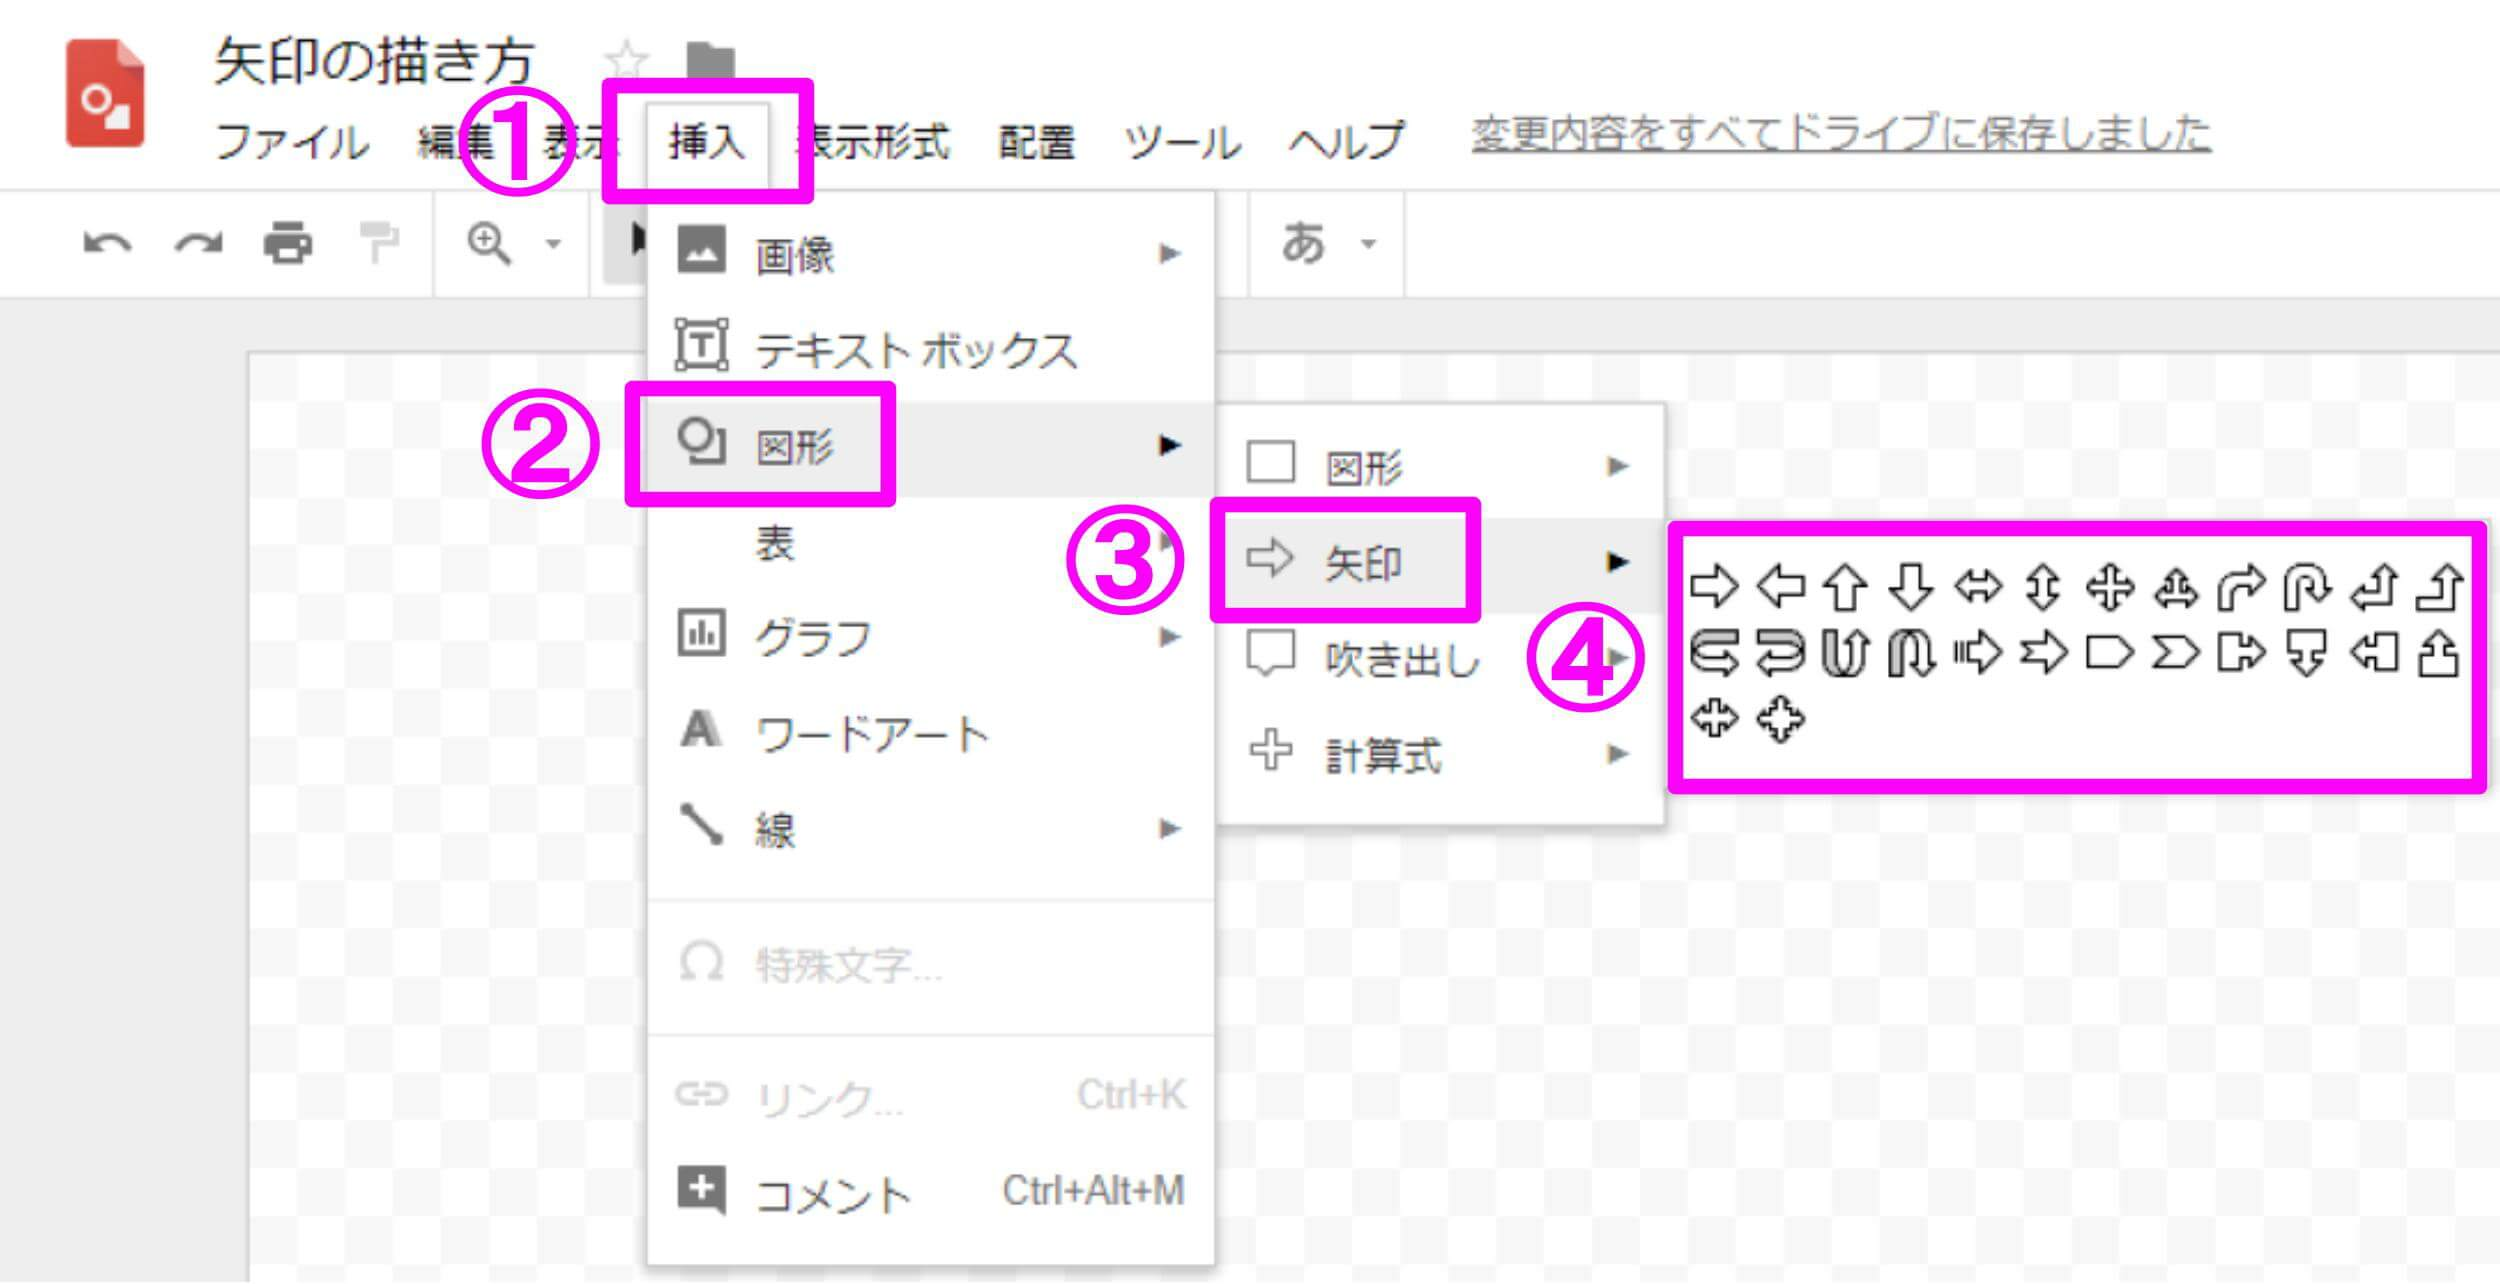 Google図形描画 矢印の描き方の手順